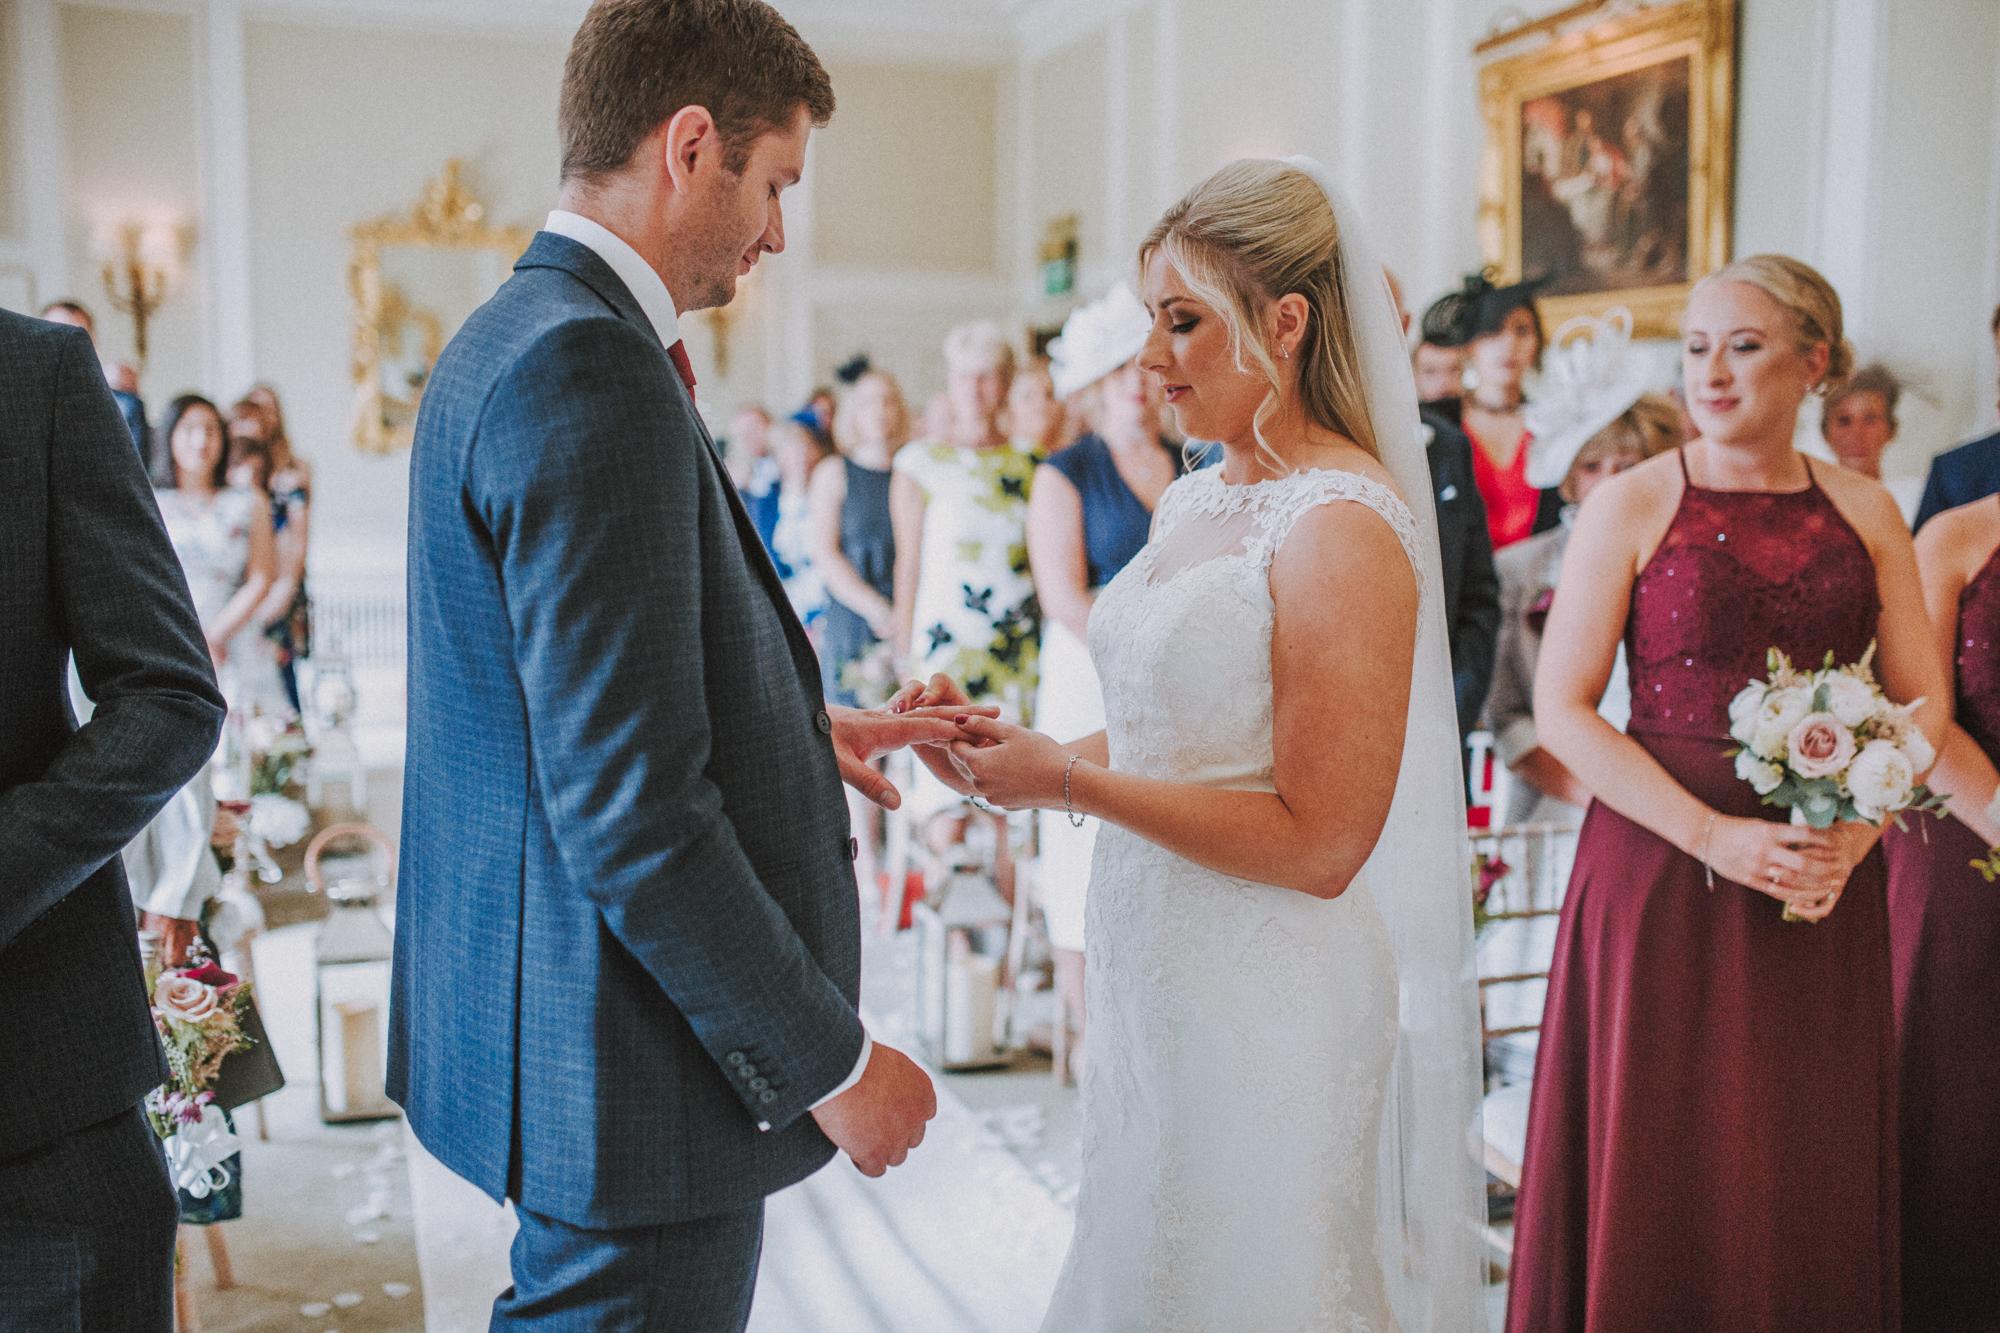 bowcliffe hall wedding photographers yorkshire-26.jpg